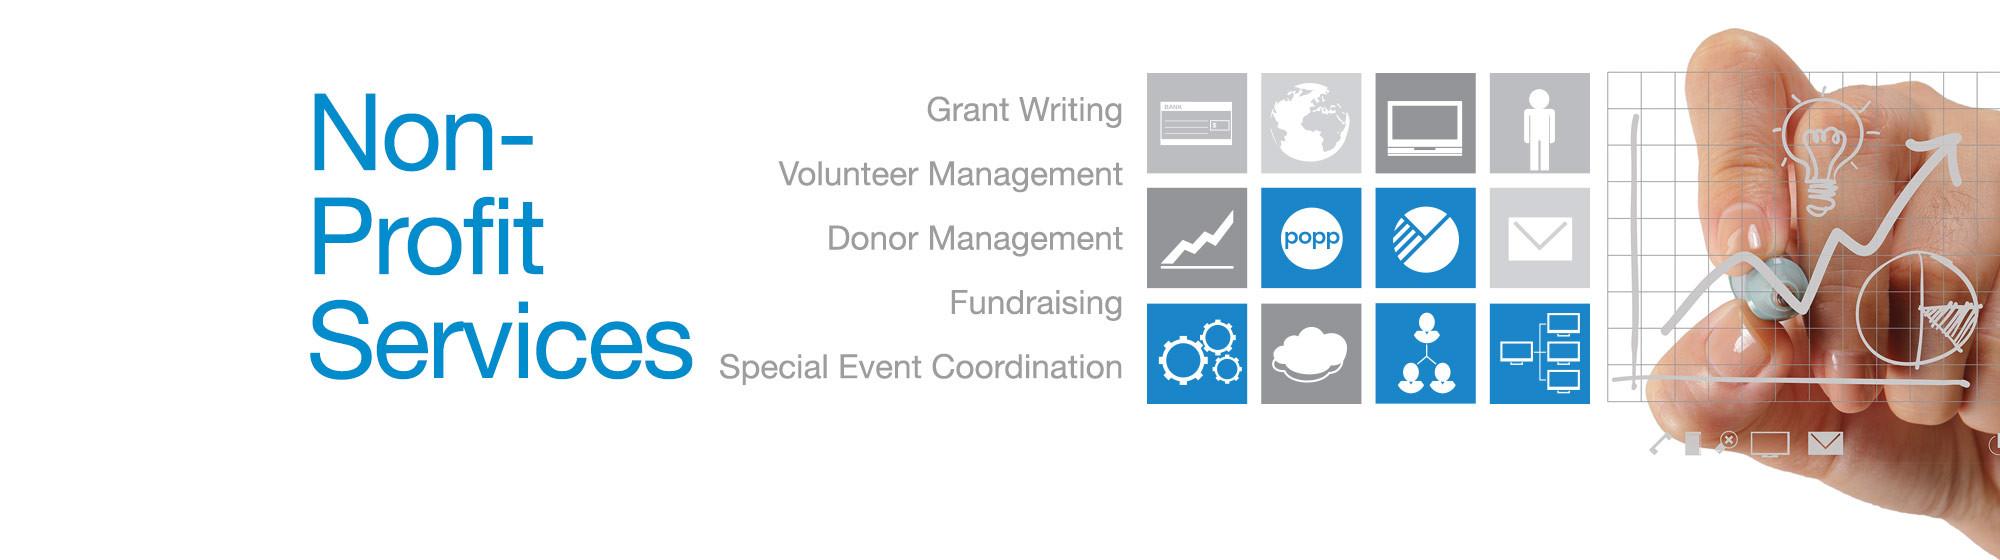 slider-nonprofit-new - Copy.jpg